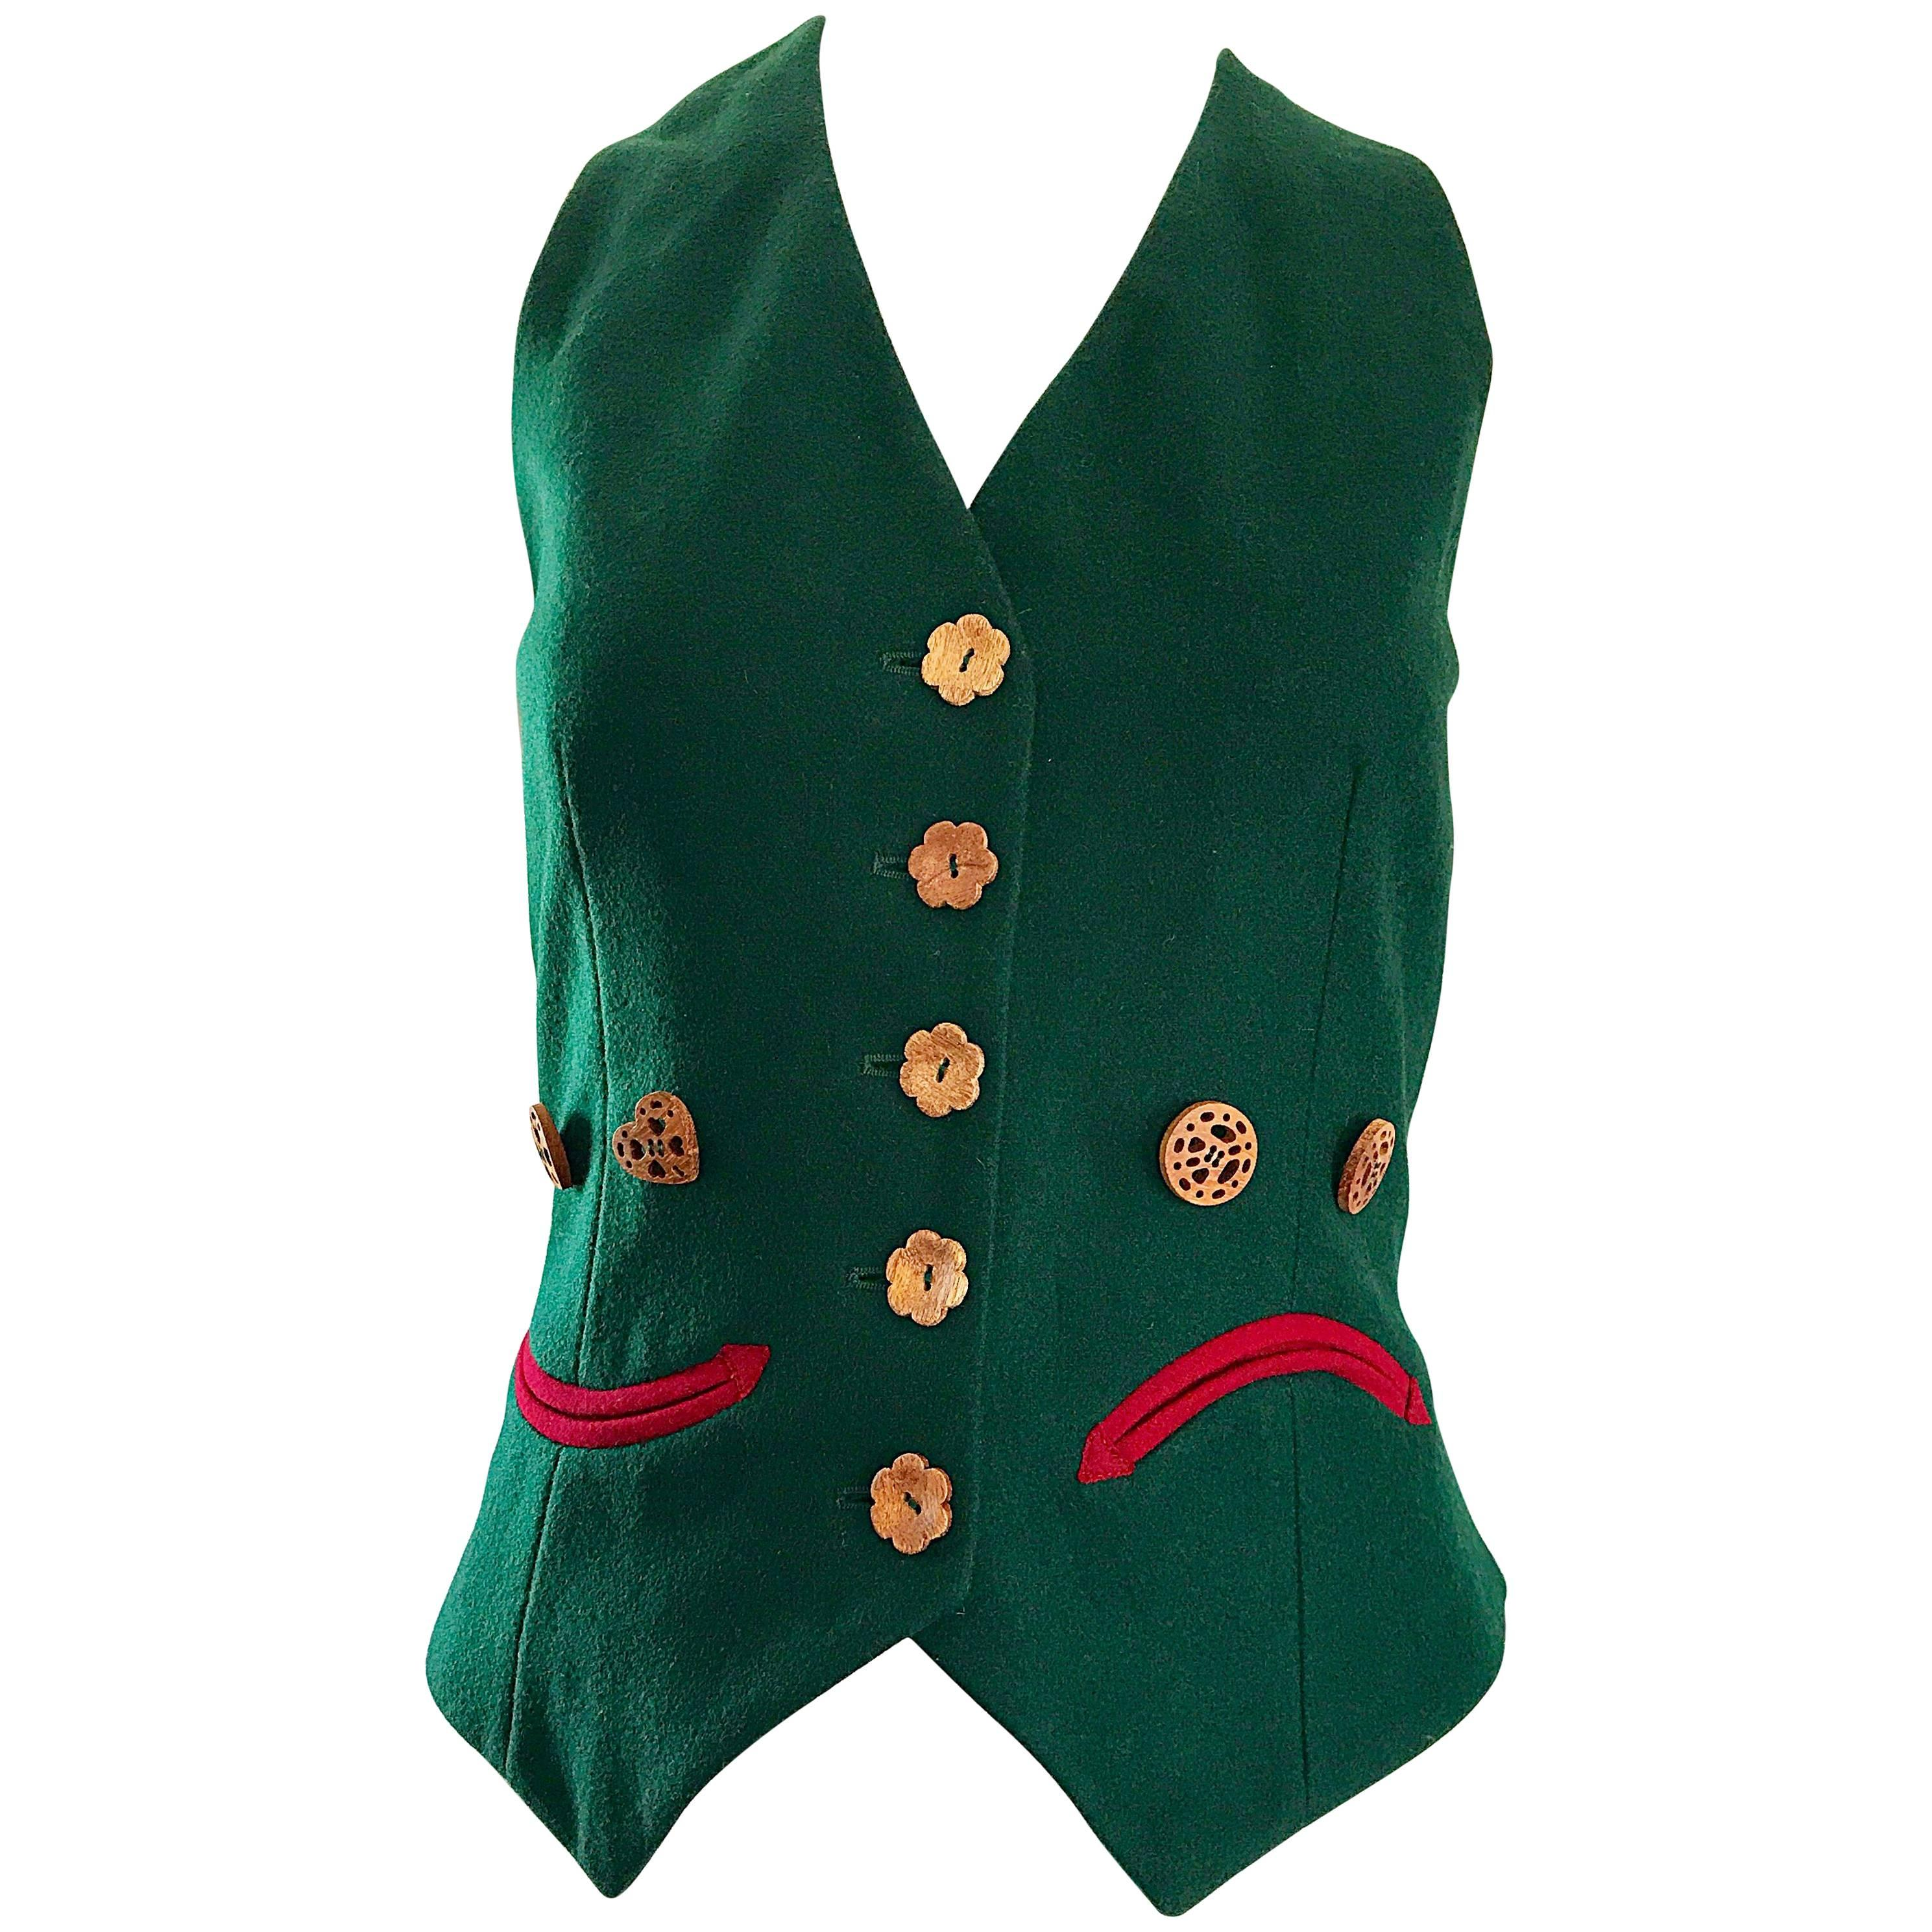 1990s Moschino Cheap & Chic Happy / Sad Hunter Green Carved Wood Waistcoat Vest